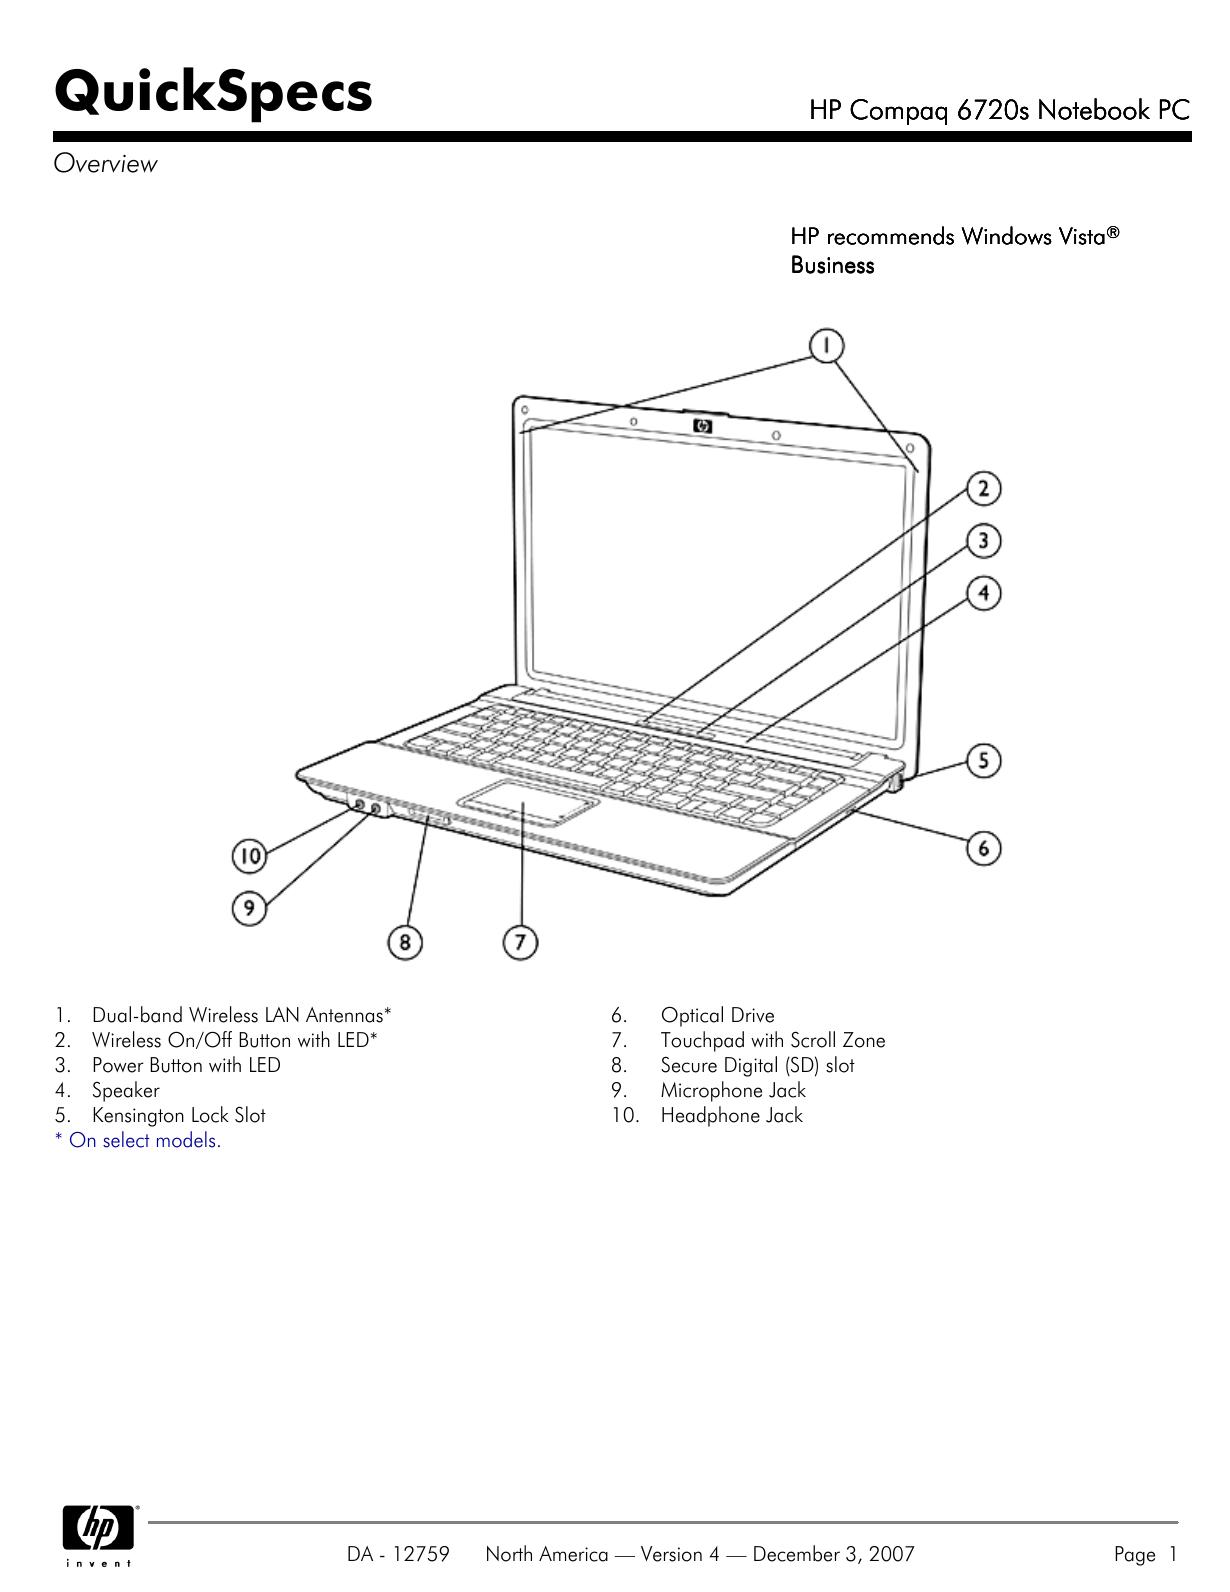 HP COMPAQ 6830S NOTEBOOK UNIVERSAL POSTSCRIPT PRINT WINDOWS DRIVER DOWNLOAD